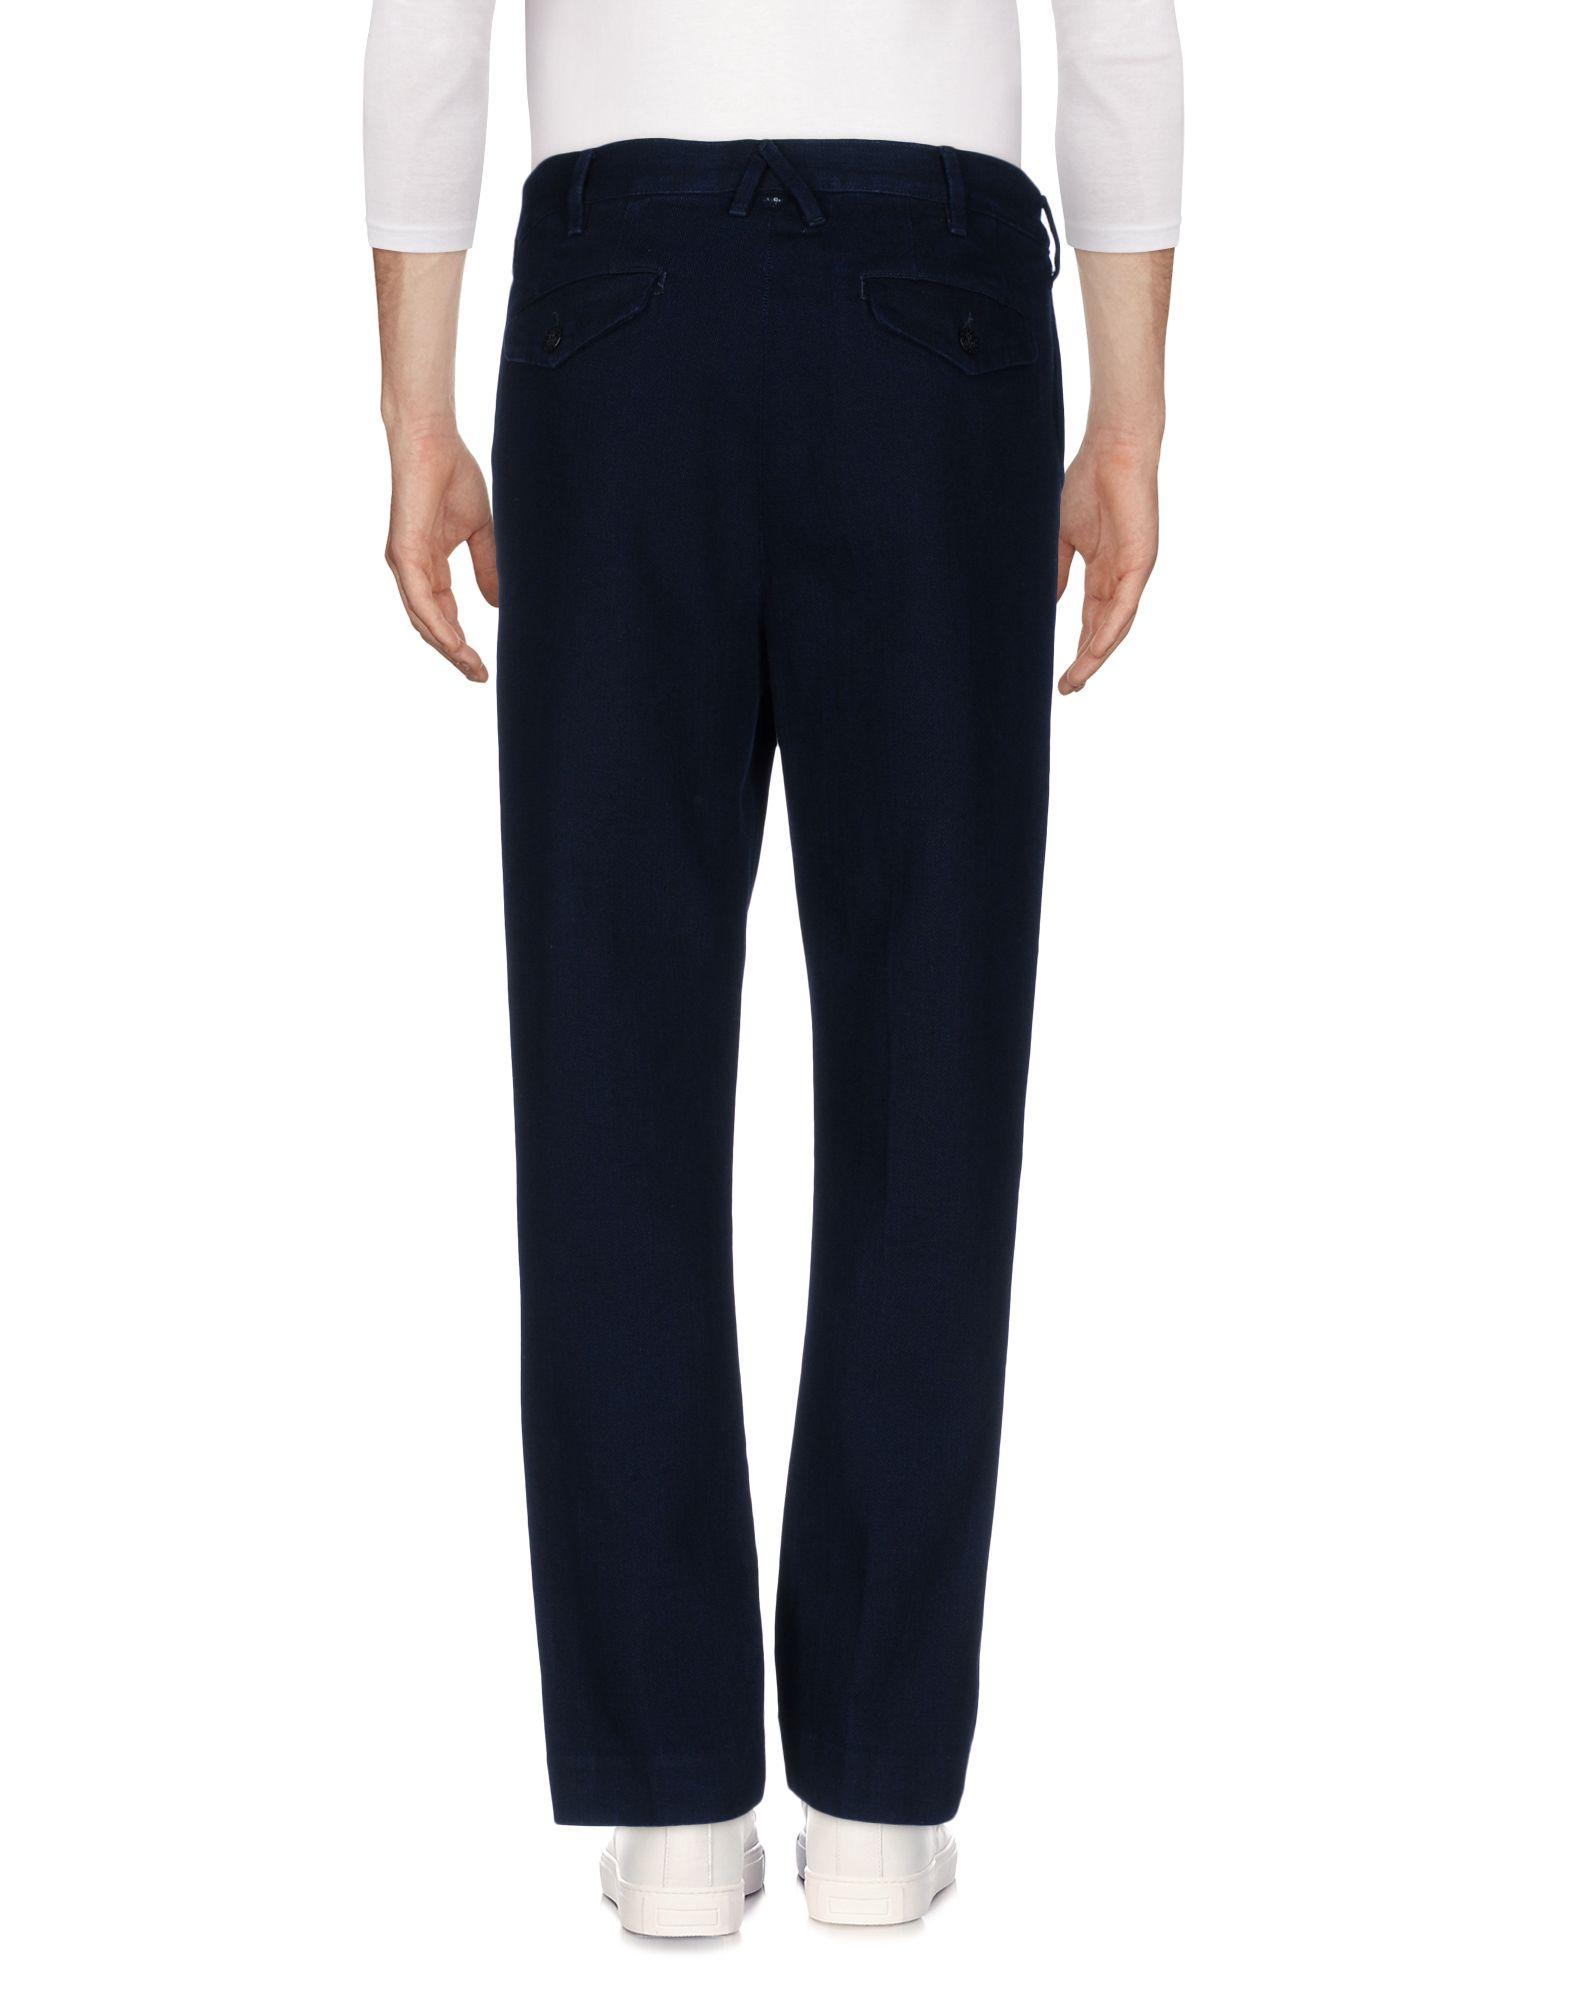 Pantaloni - Jeans Cycle Uomo - Pantaloni 13088412WA dce31c